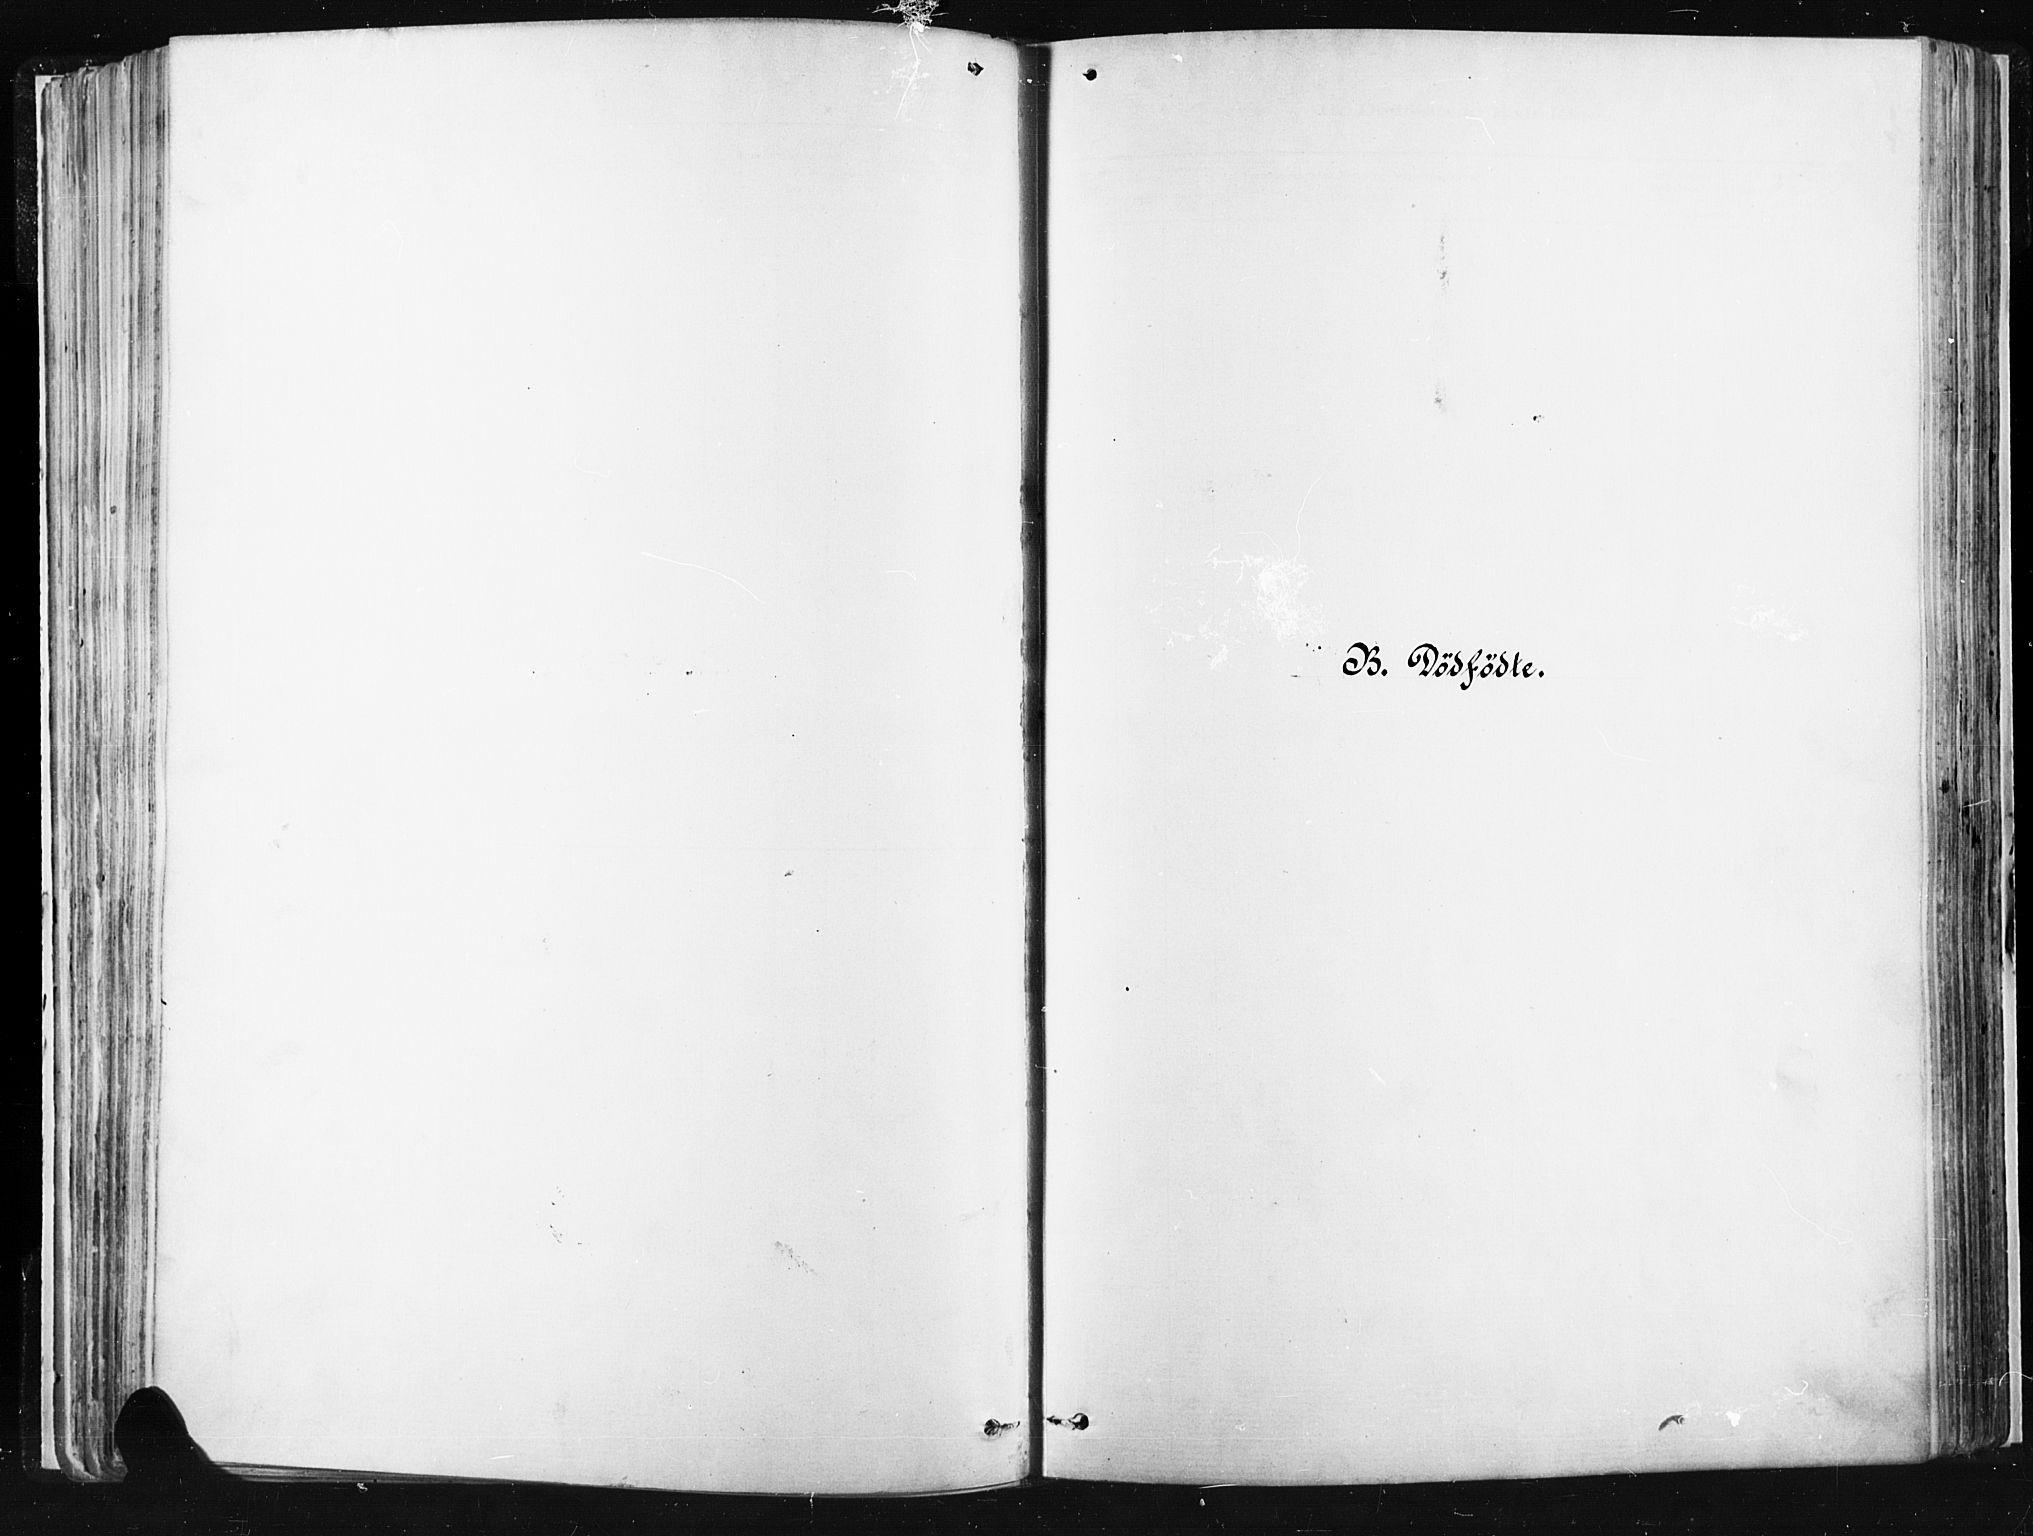 SAH, Vågå prestekontor, Ministerialbok nr. 9, 1886-1904, s. 87